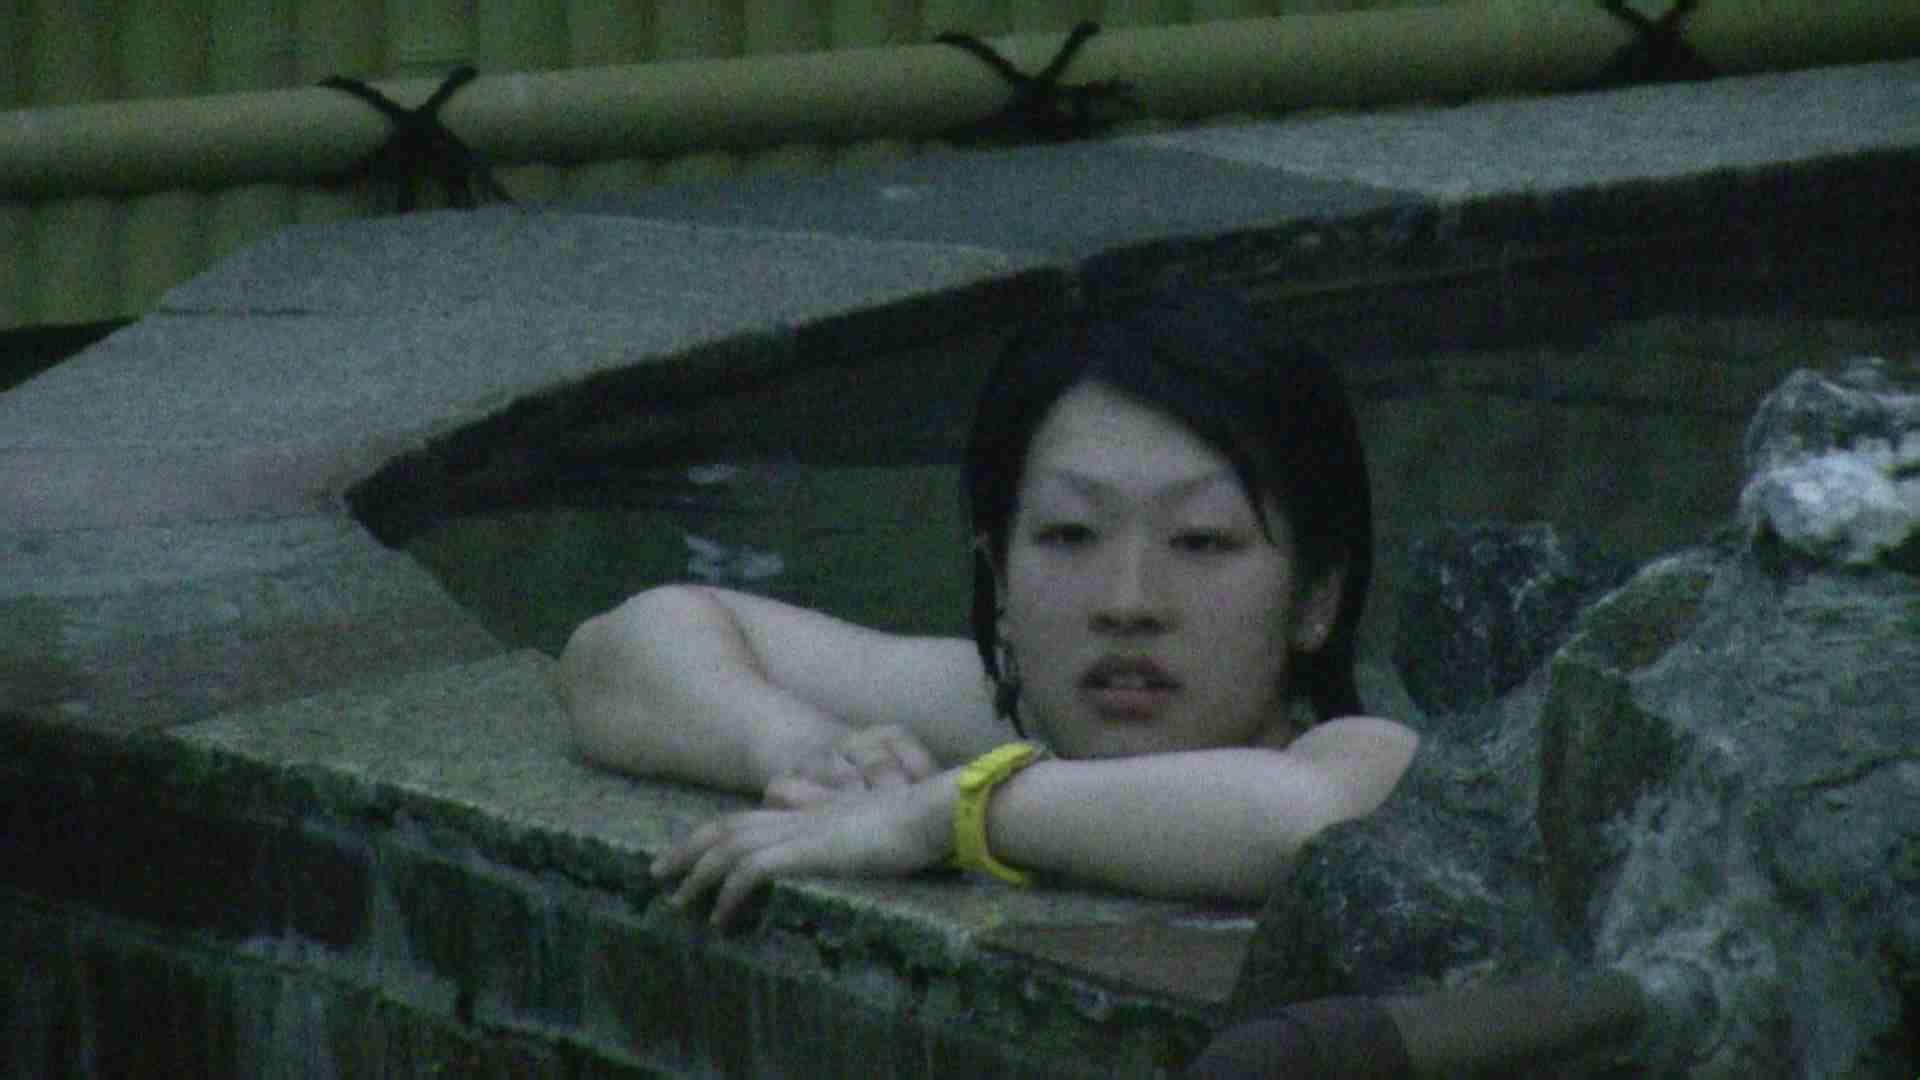 Aquaな露天風呂Vol.05【VIP】 露天風呂編  112PIX 90